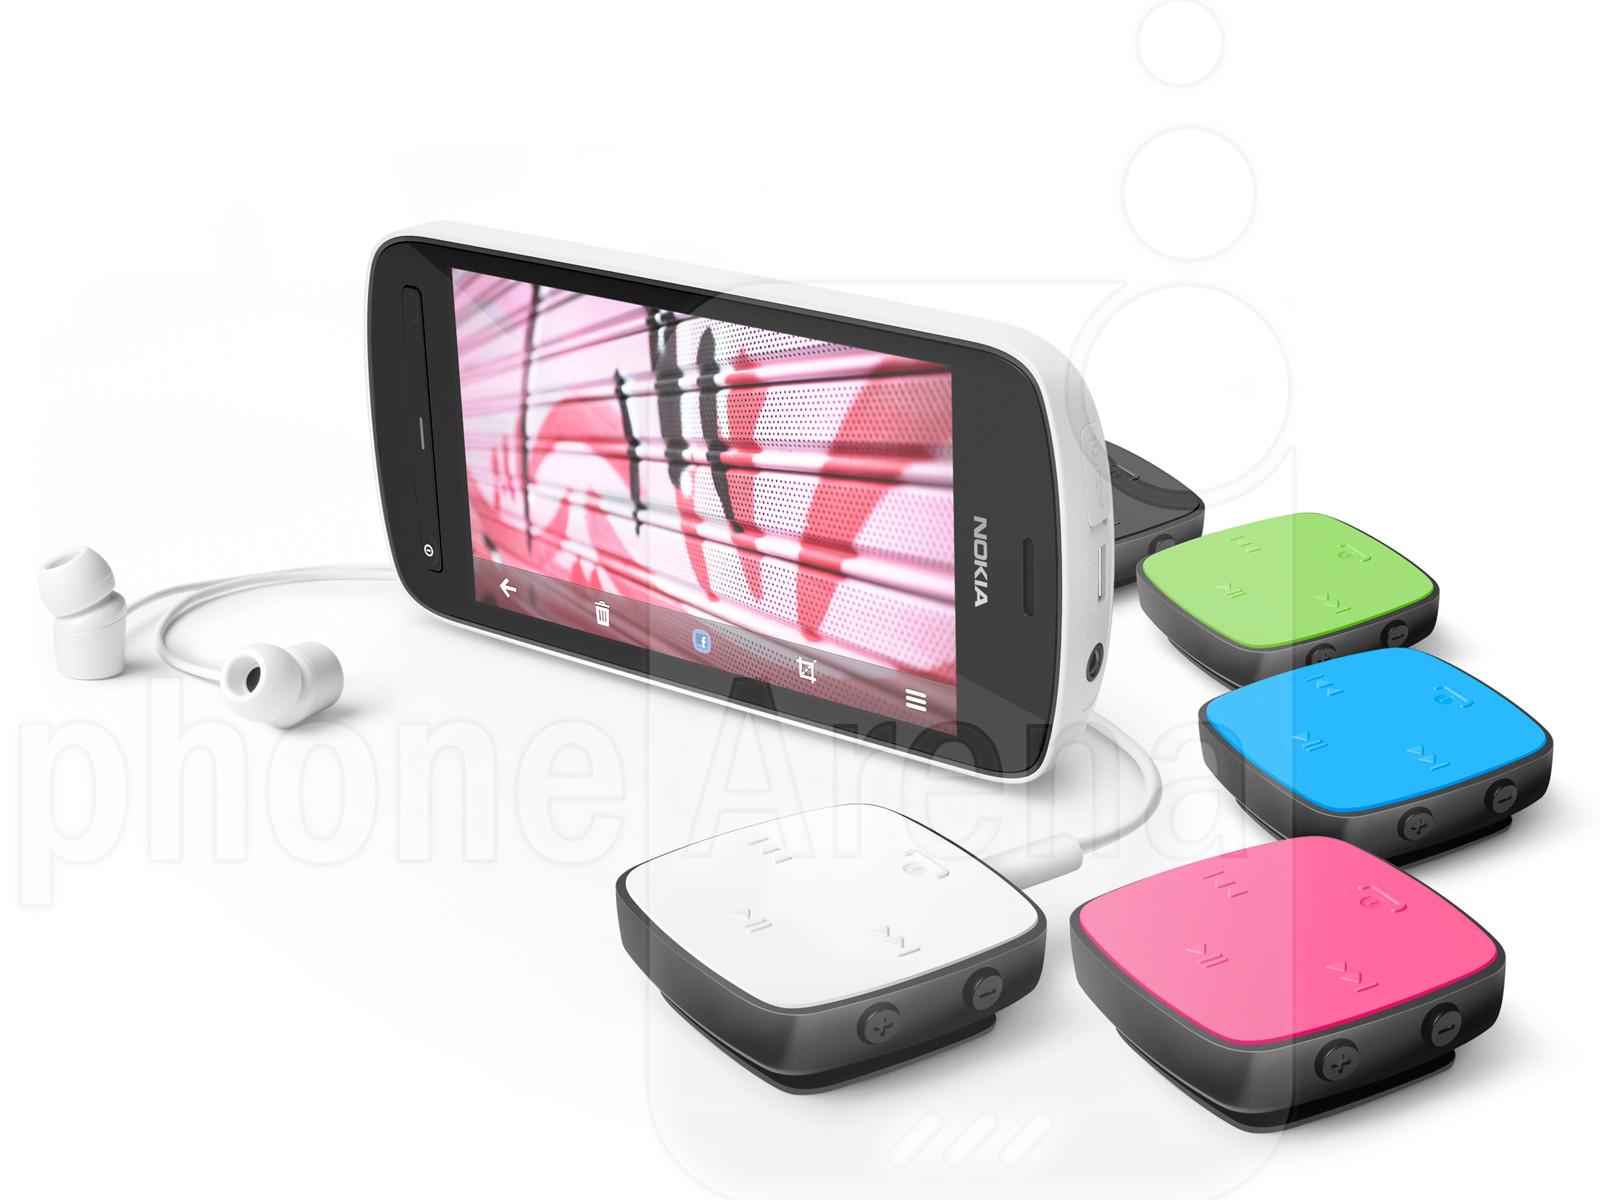 Nokia Pureview 808 with 41-Megapixel Camera